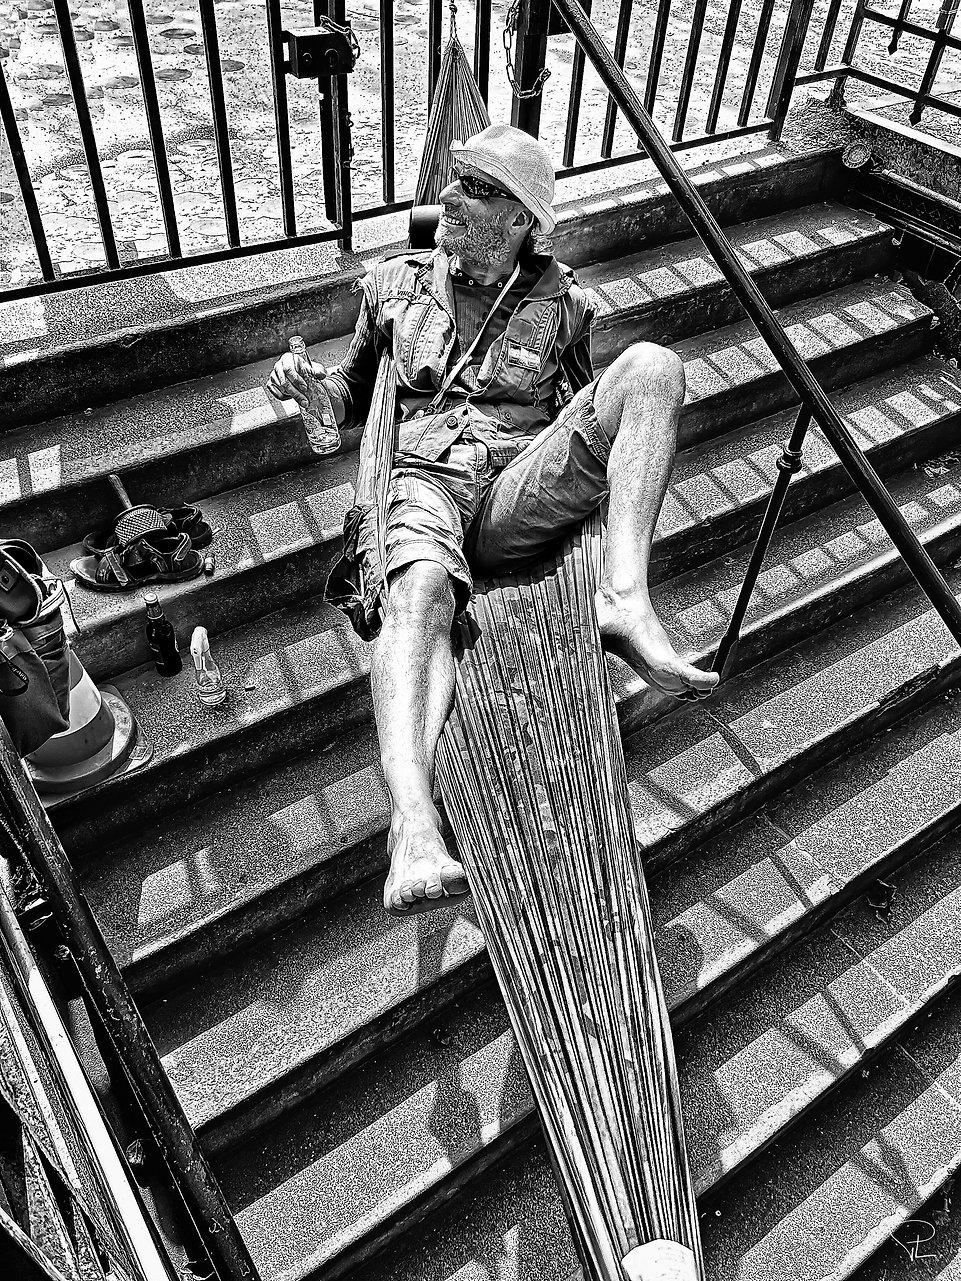 corona,covid,metro,paris,homeless,streetphotography,bnw